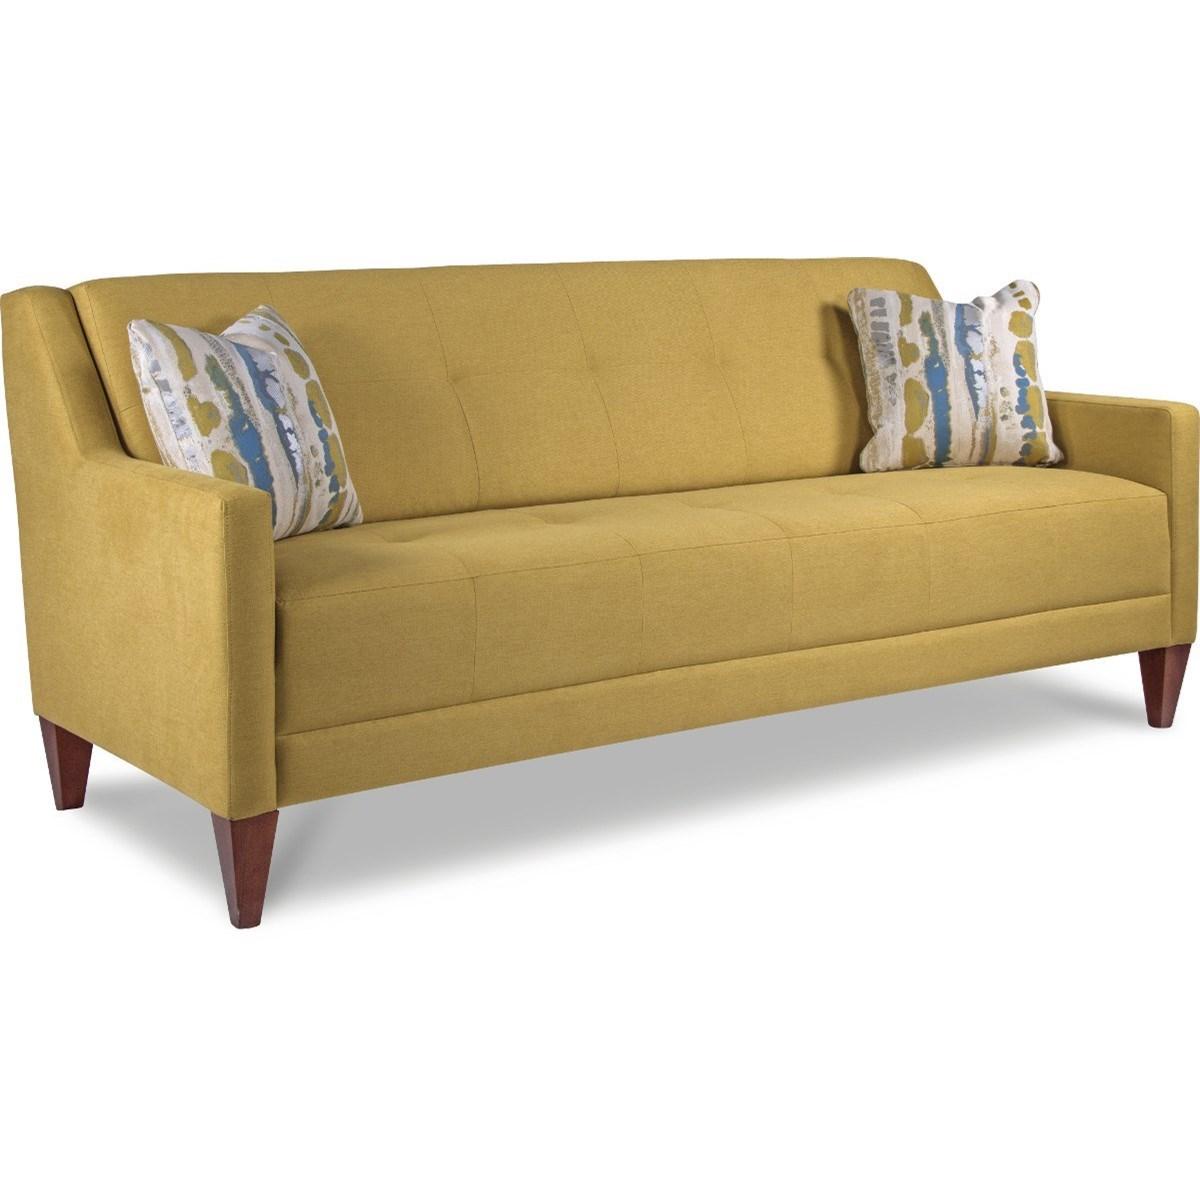 La Z Boy Verve Mid Century Modern Sofa With Tufting